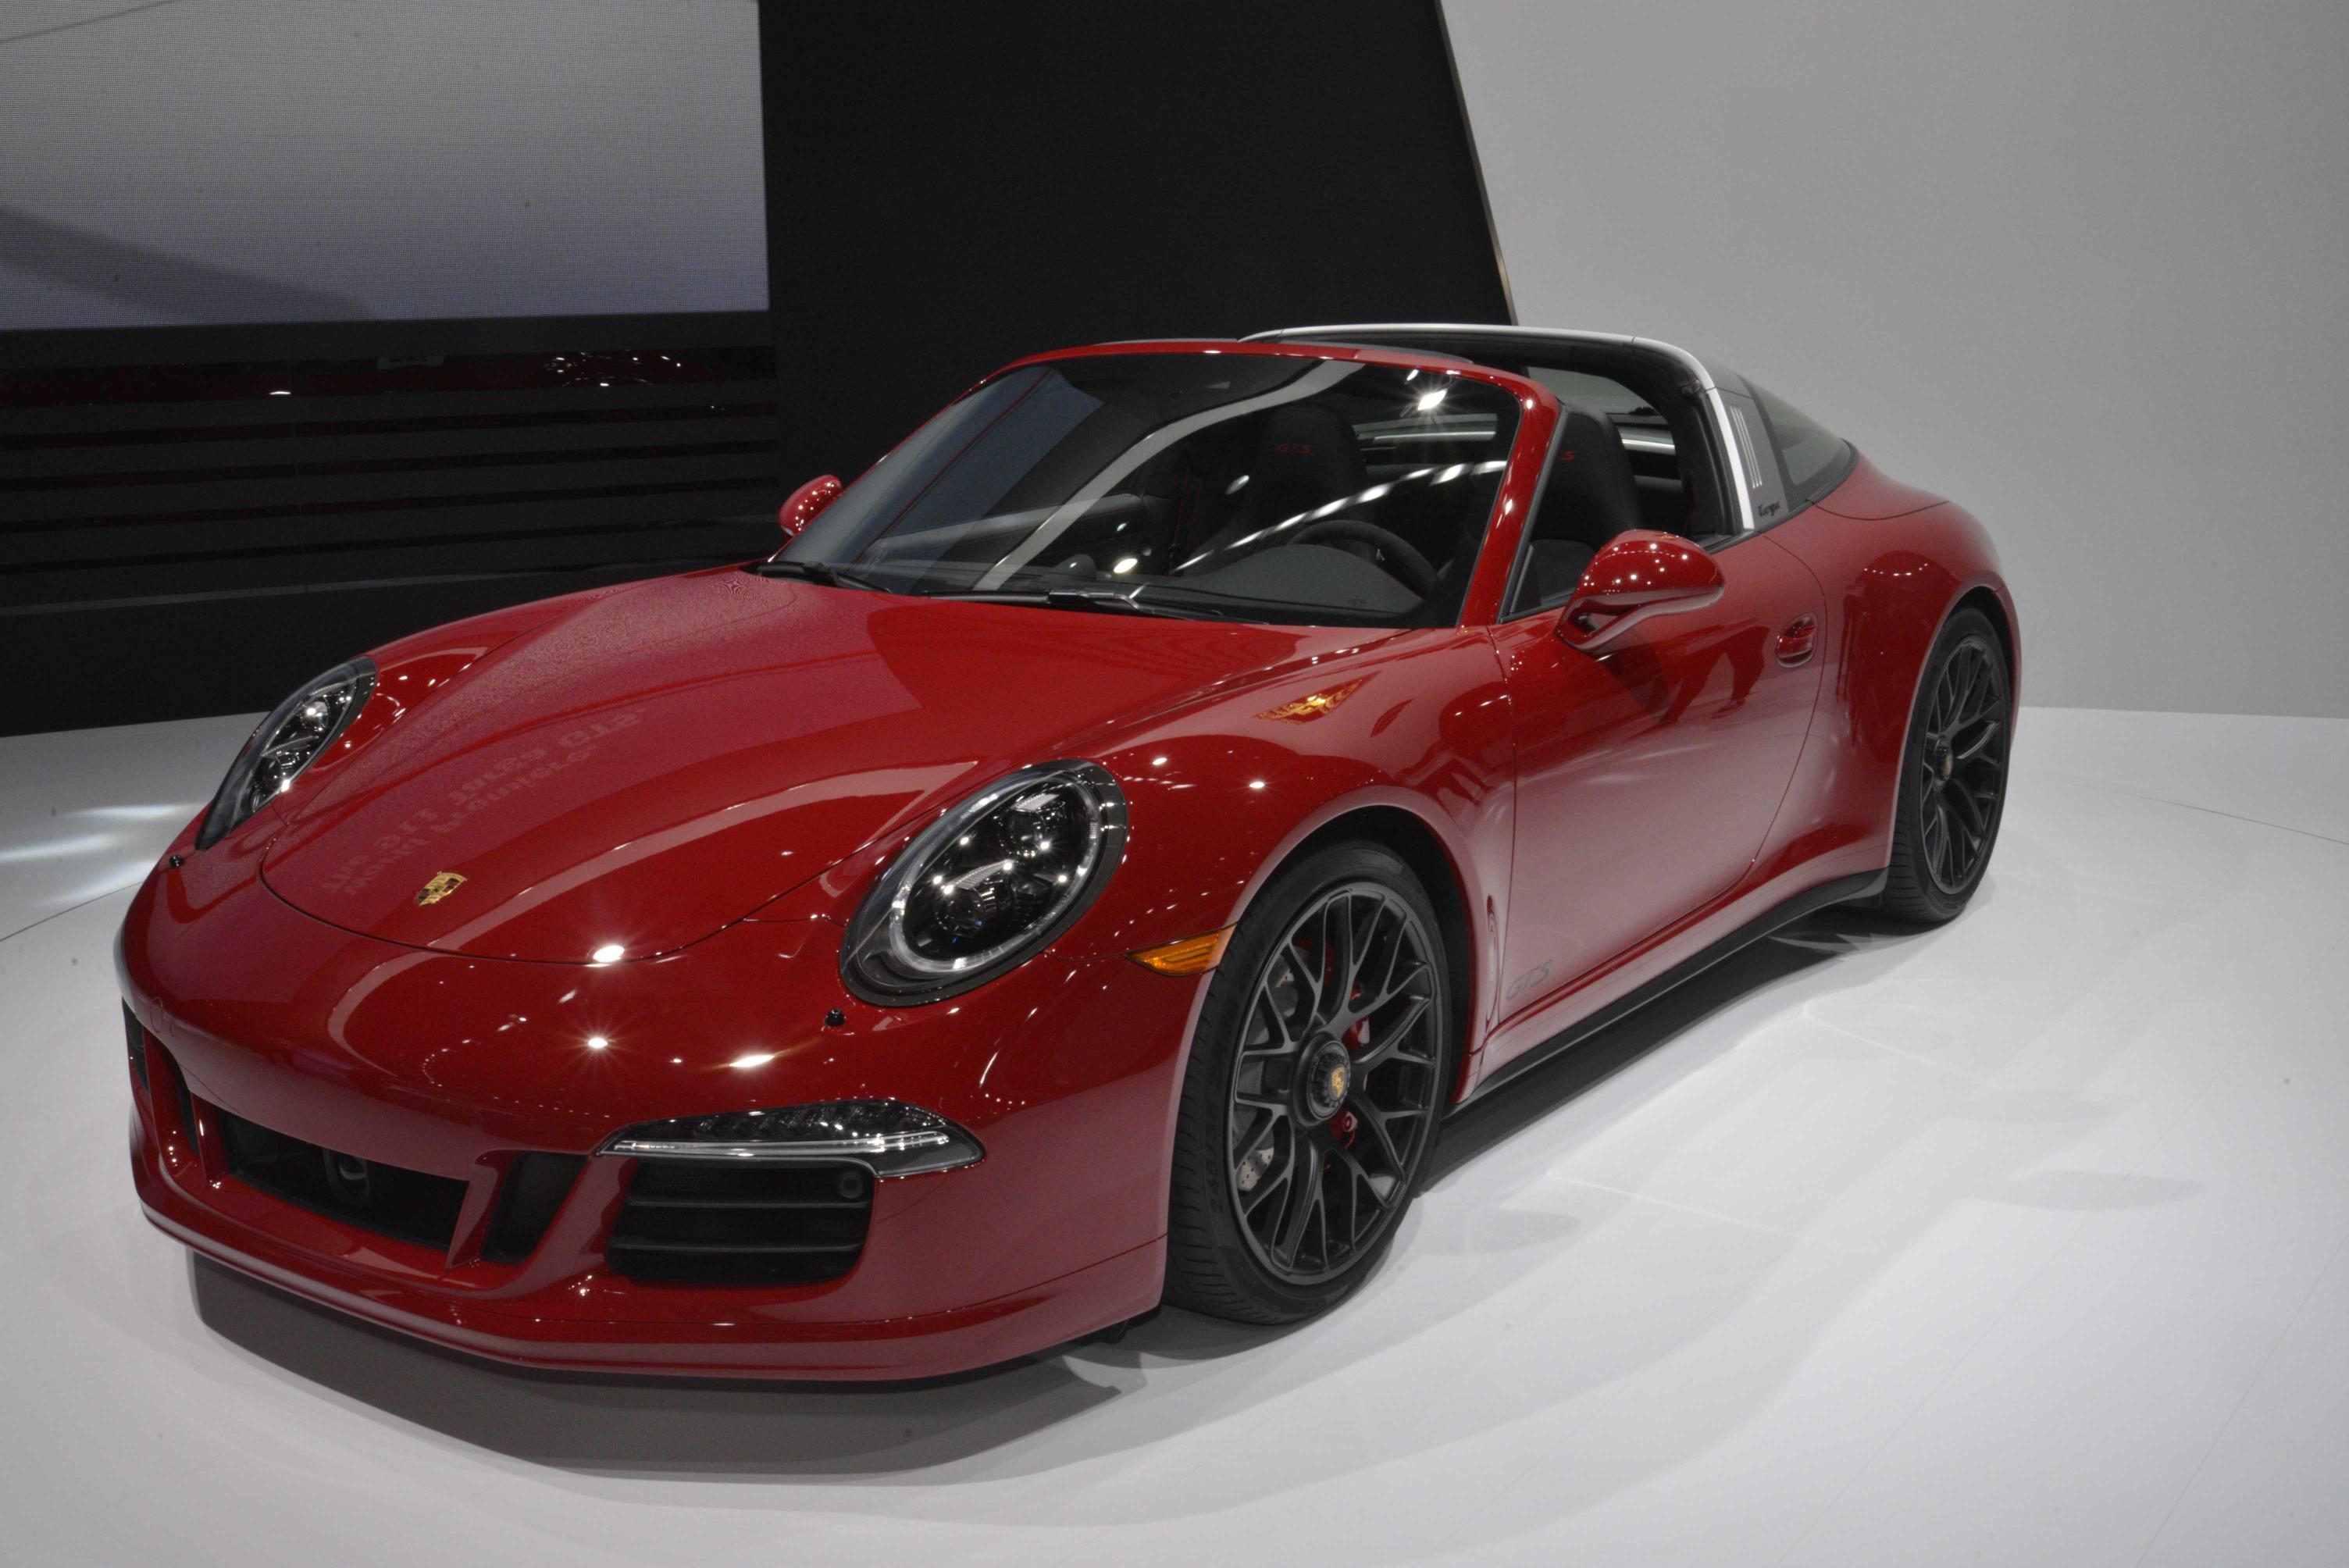 Porsche 911 Targa 4 Gts Drops Its Top At 2015 Naias Image